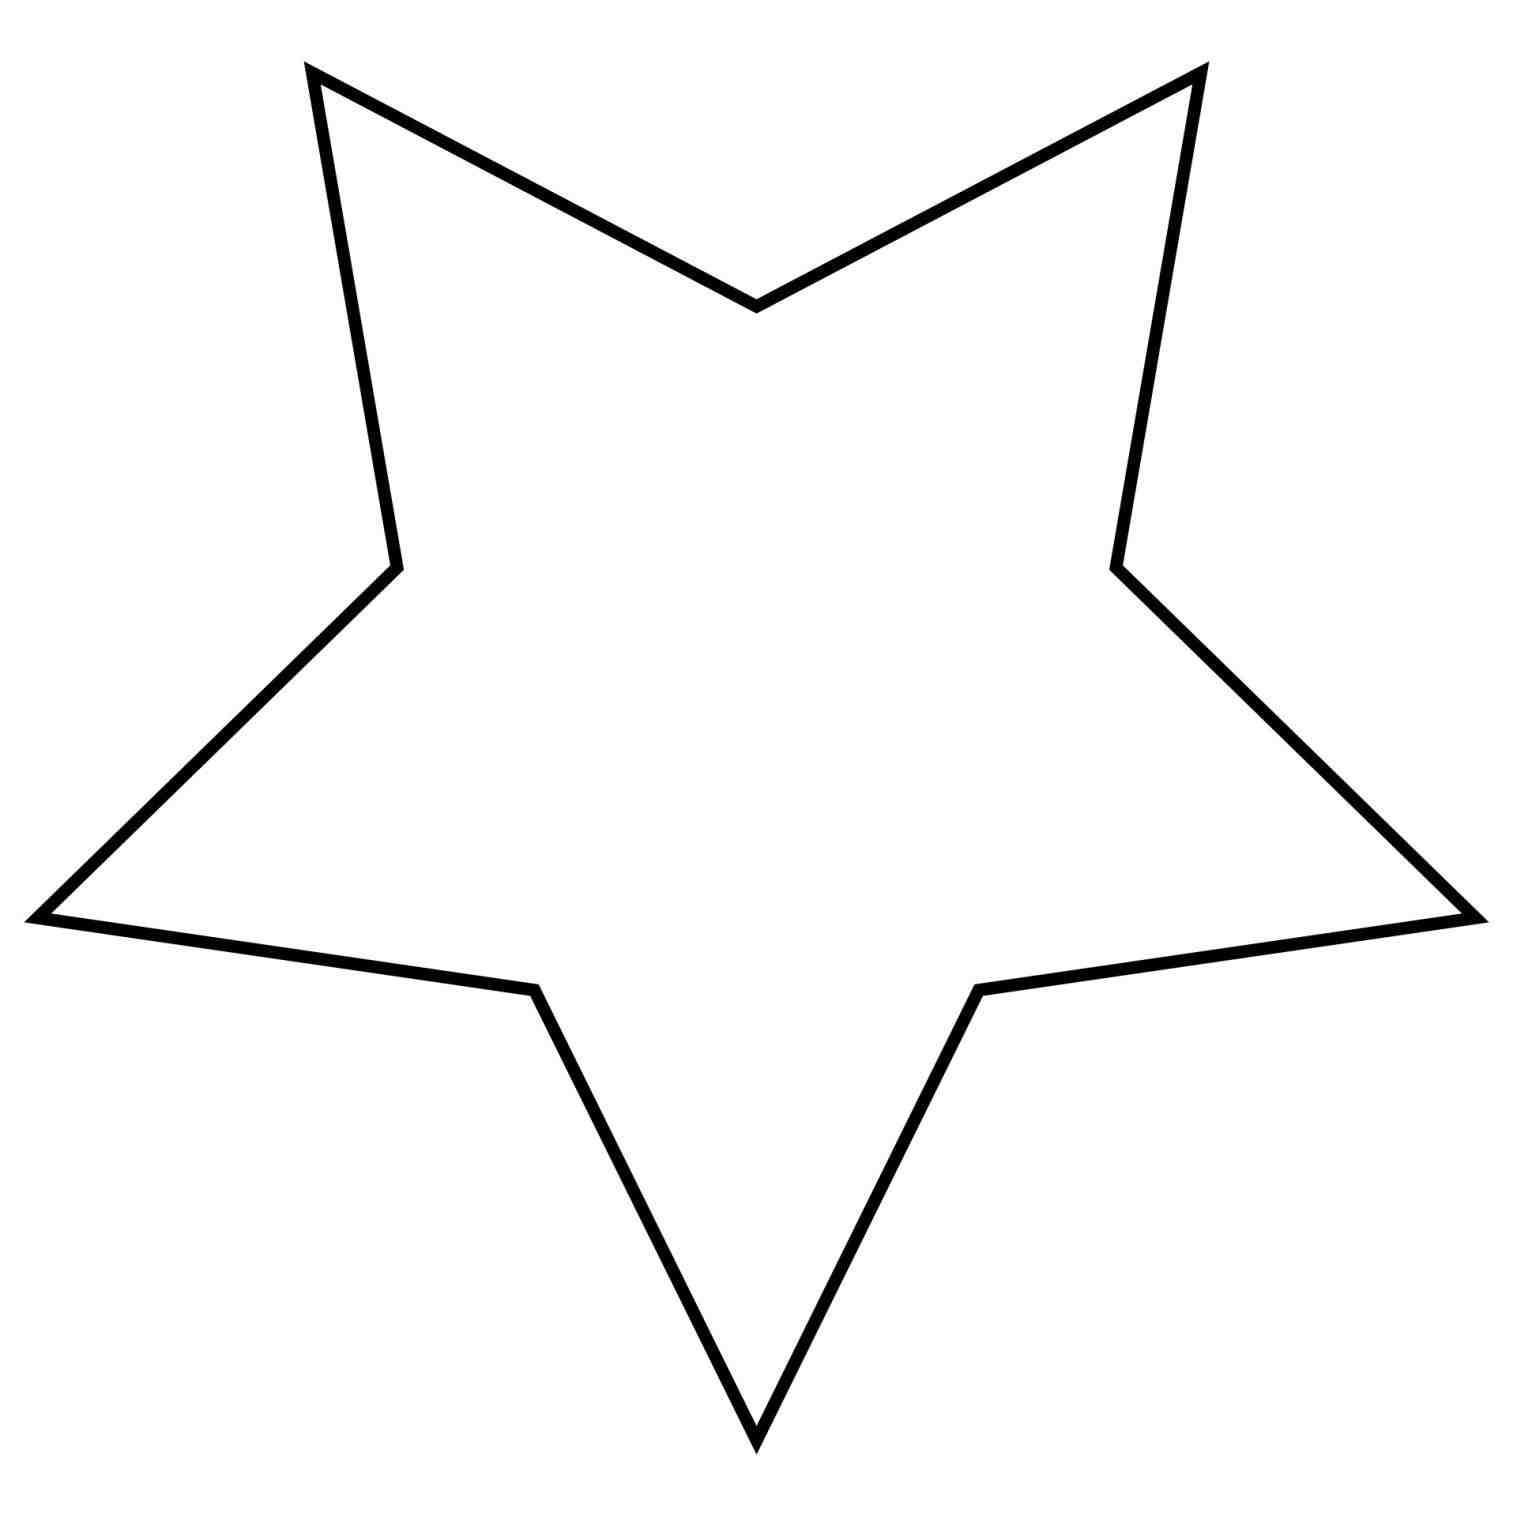 1517x1513 Christmas Star Outline Printable Cheminee.website